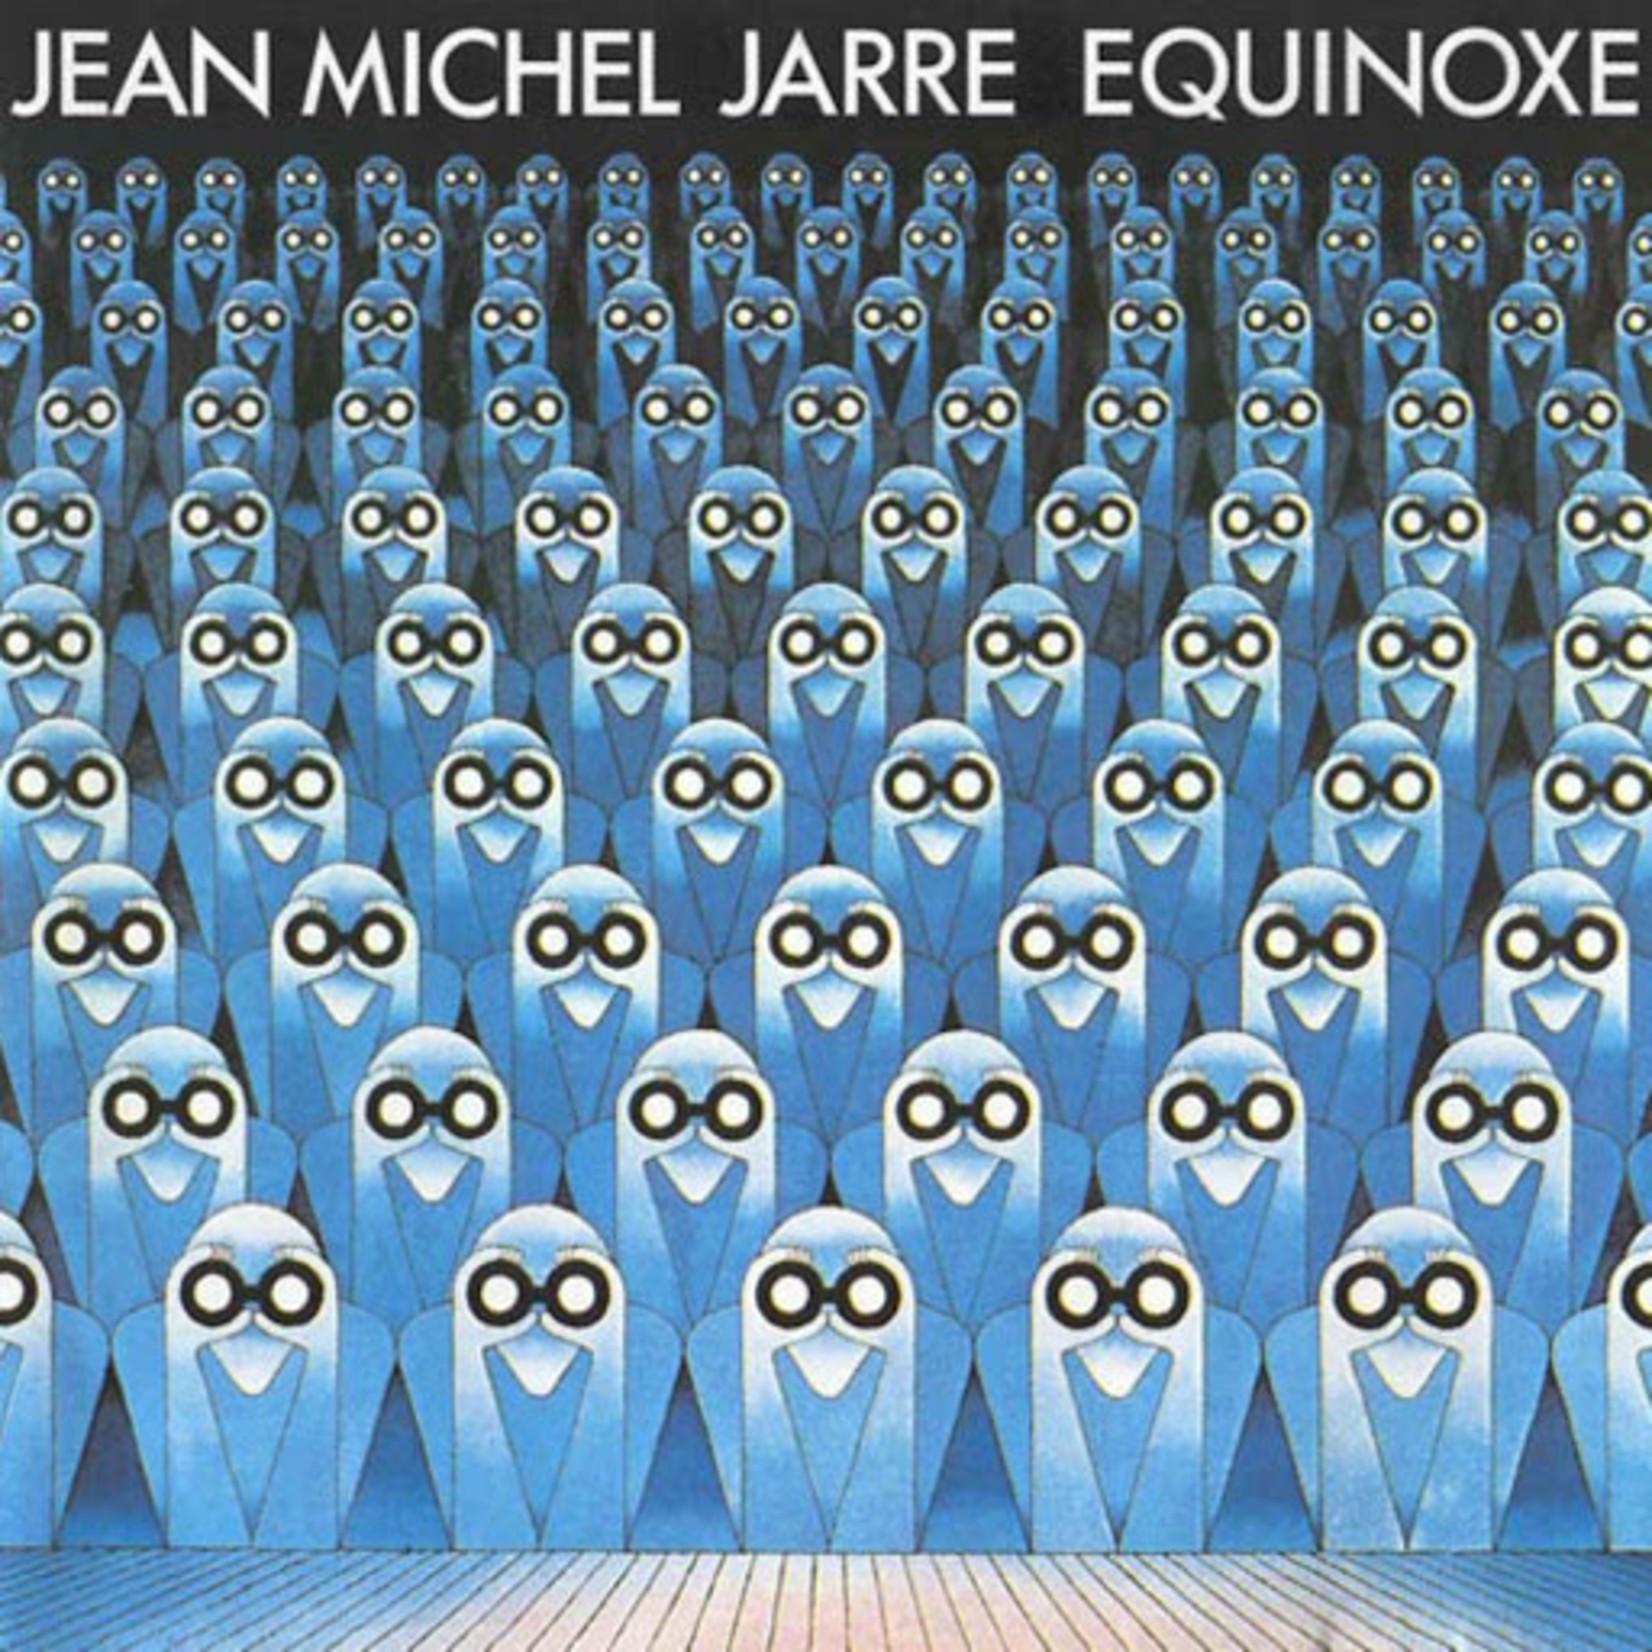 [New] Jarre, Jean Michel: Equinoxe